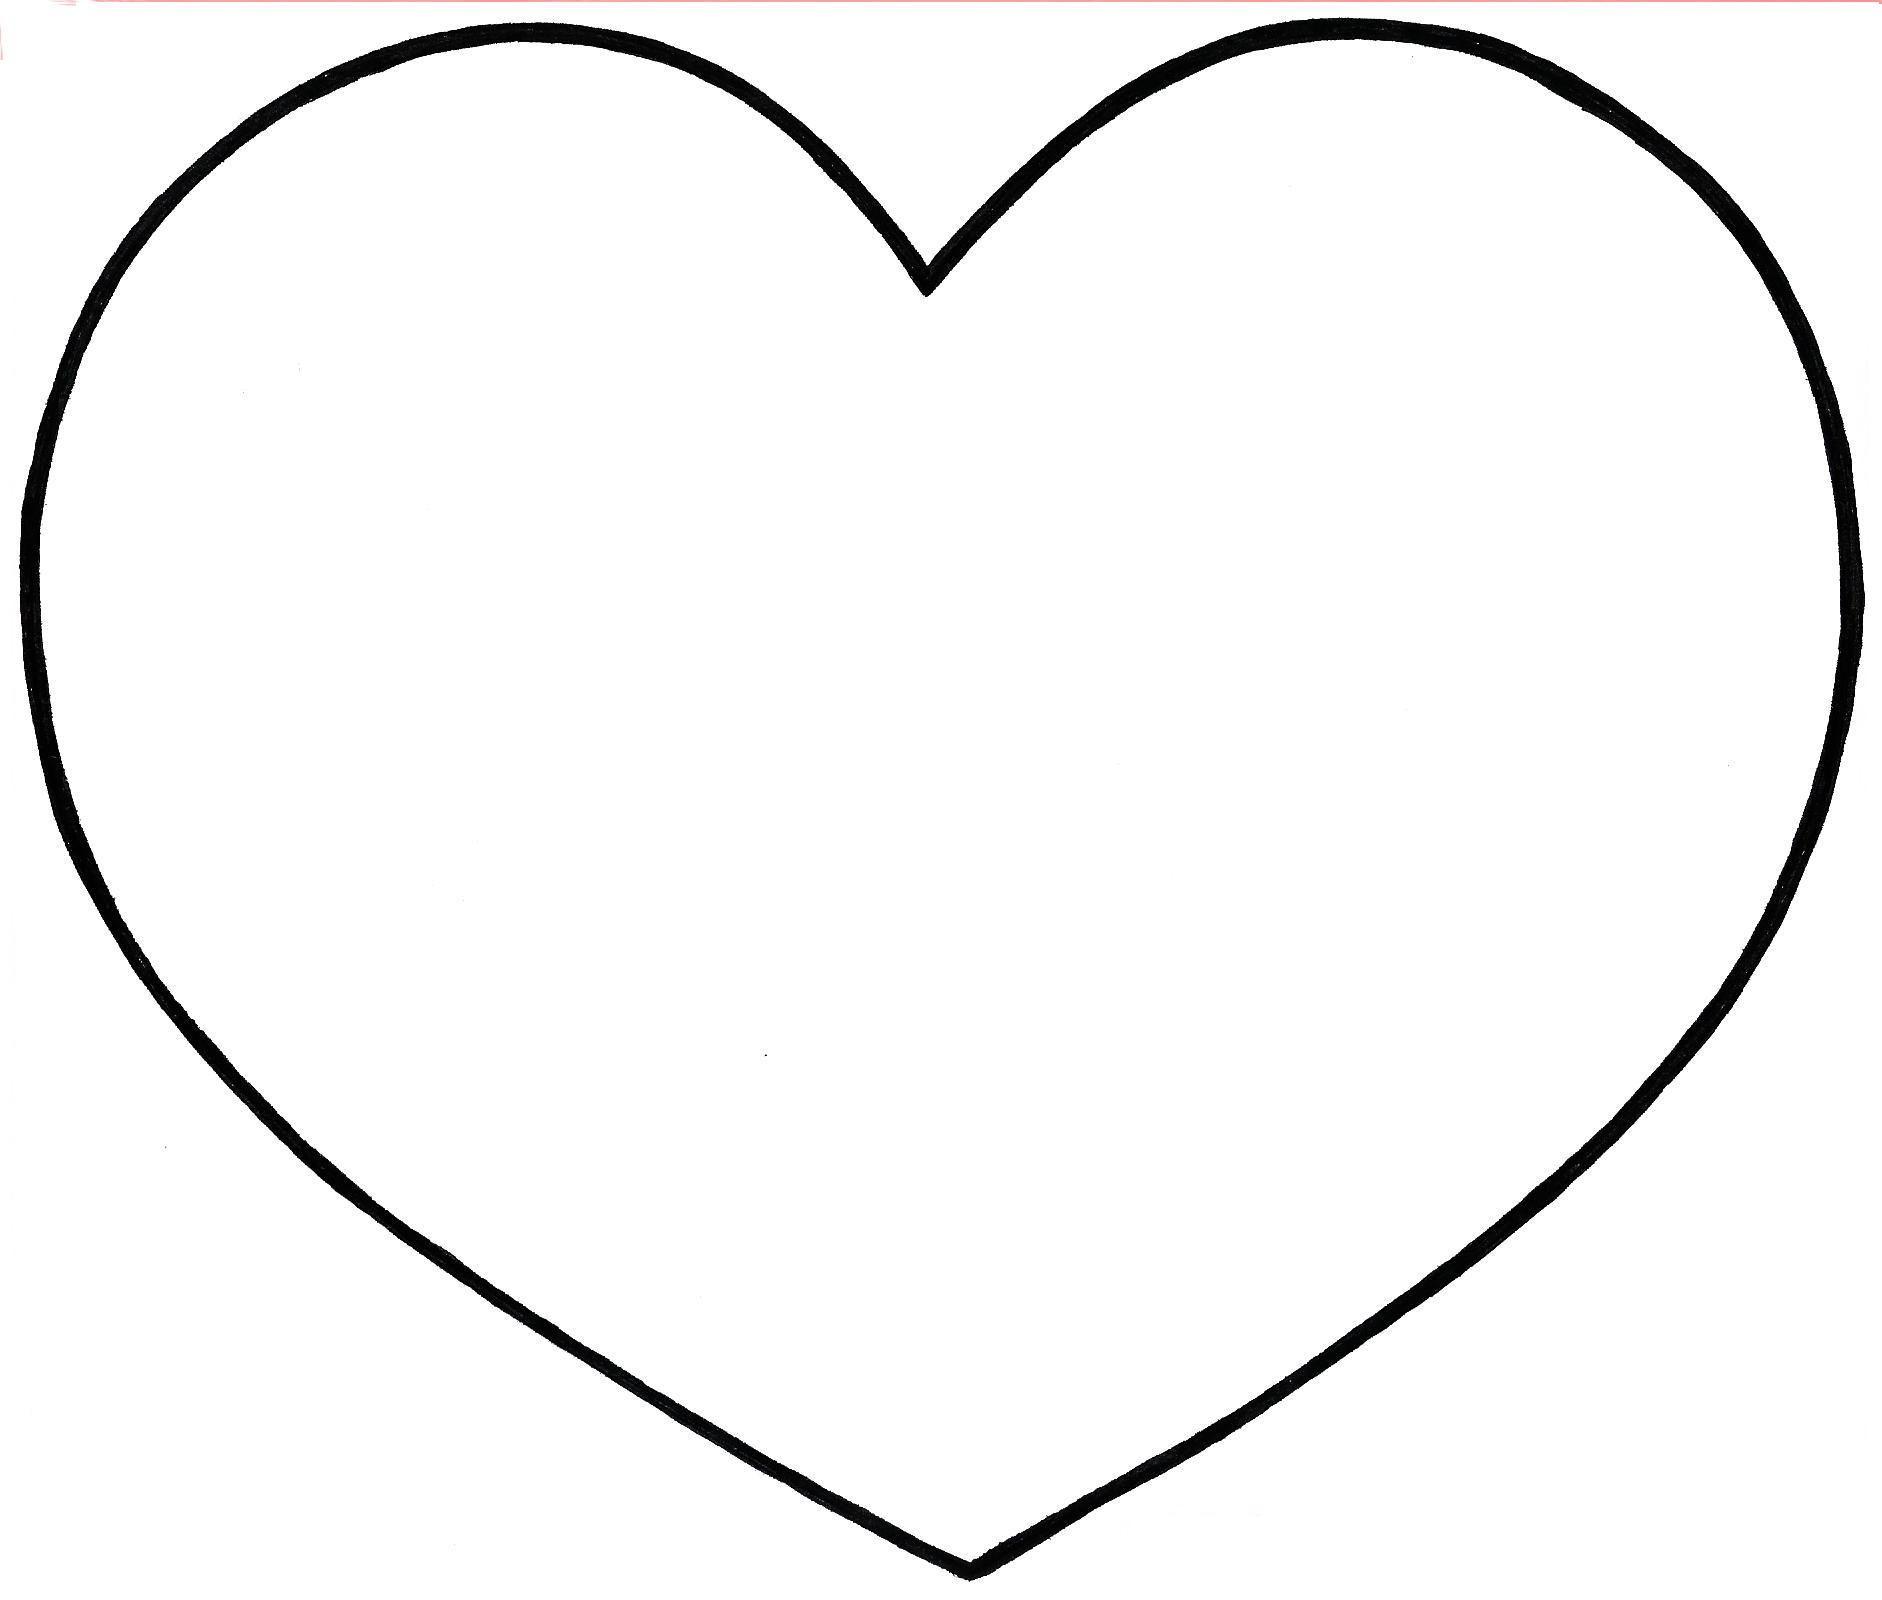 dessin en couleurs imprimer chiffres et formes coeur num ro 448264 mariage pinterest. Black Bedroom Furniture Sets. Home Design Ideas